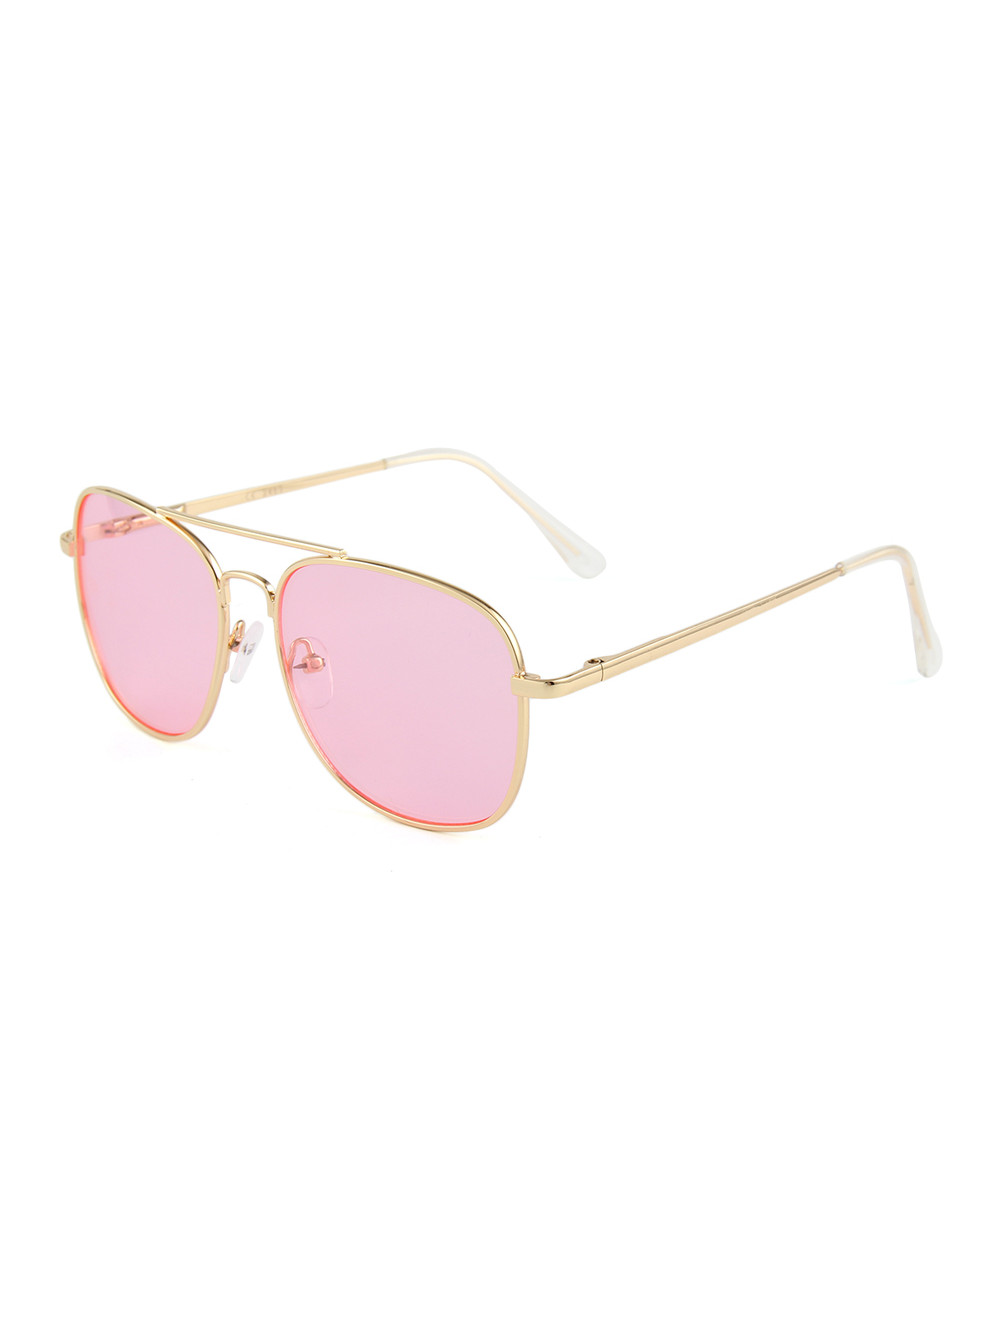 Slnečné okuliare Aviator Square Pink 5ec6ef60964